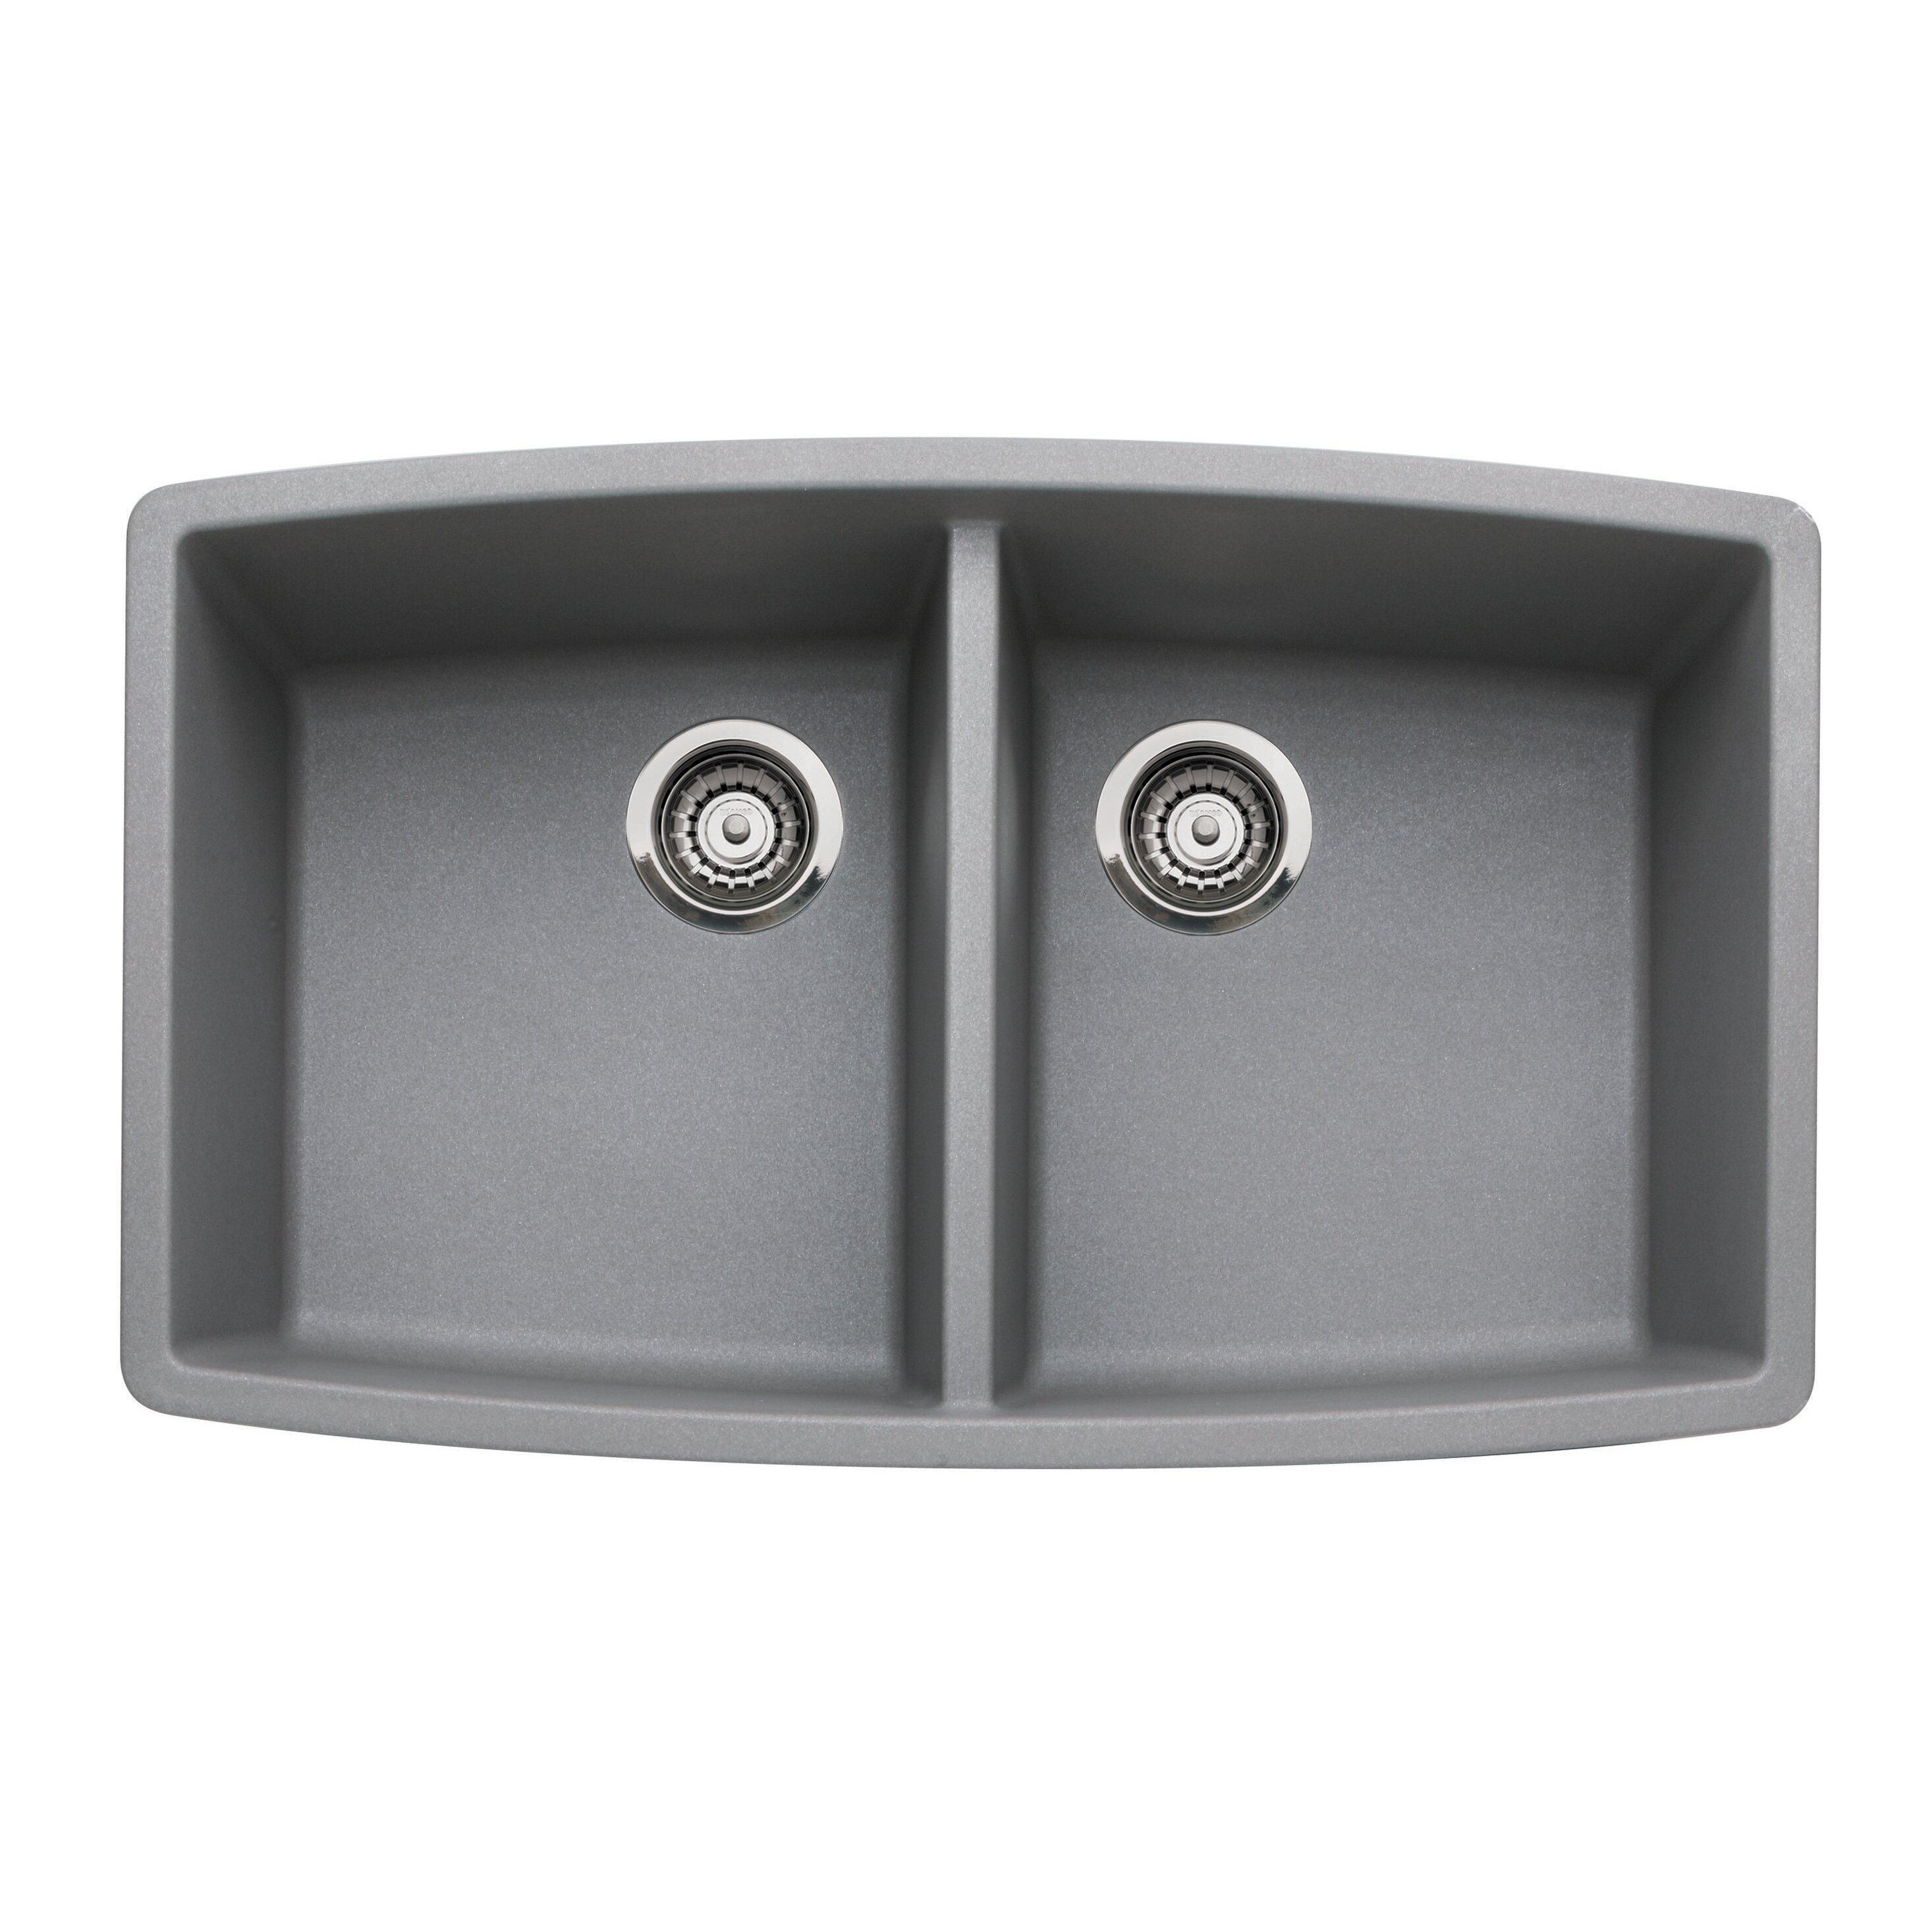 Blanco Granite Kitchen Sinks Blanco Performa 33 X 20 Double Bowl Kitchen Sink Reviews Wayfair